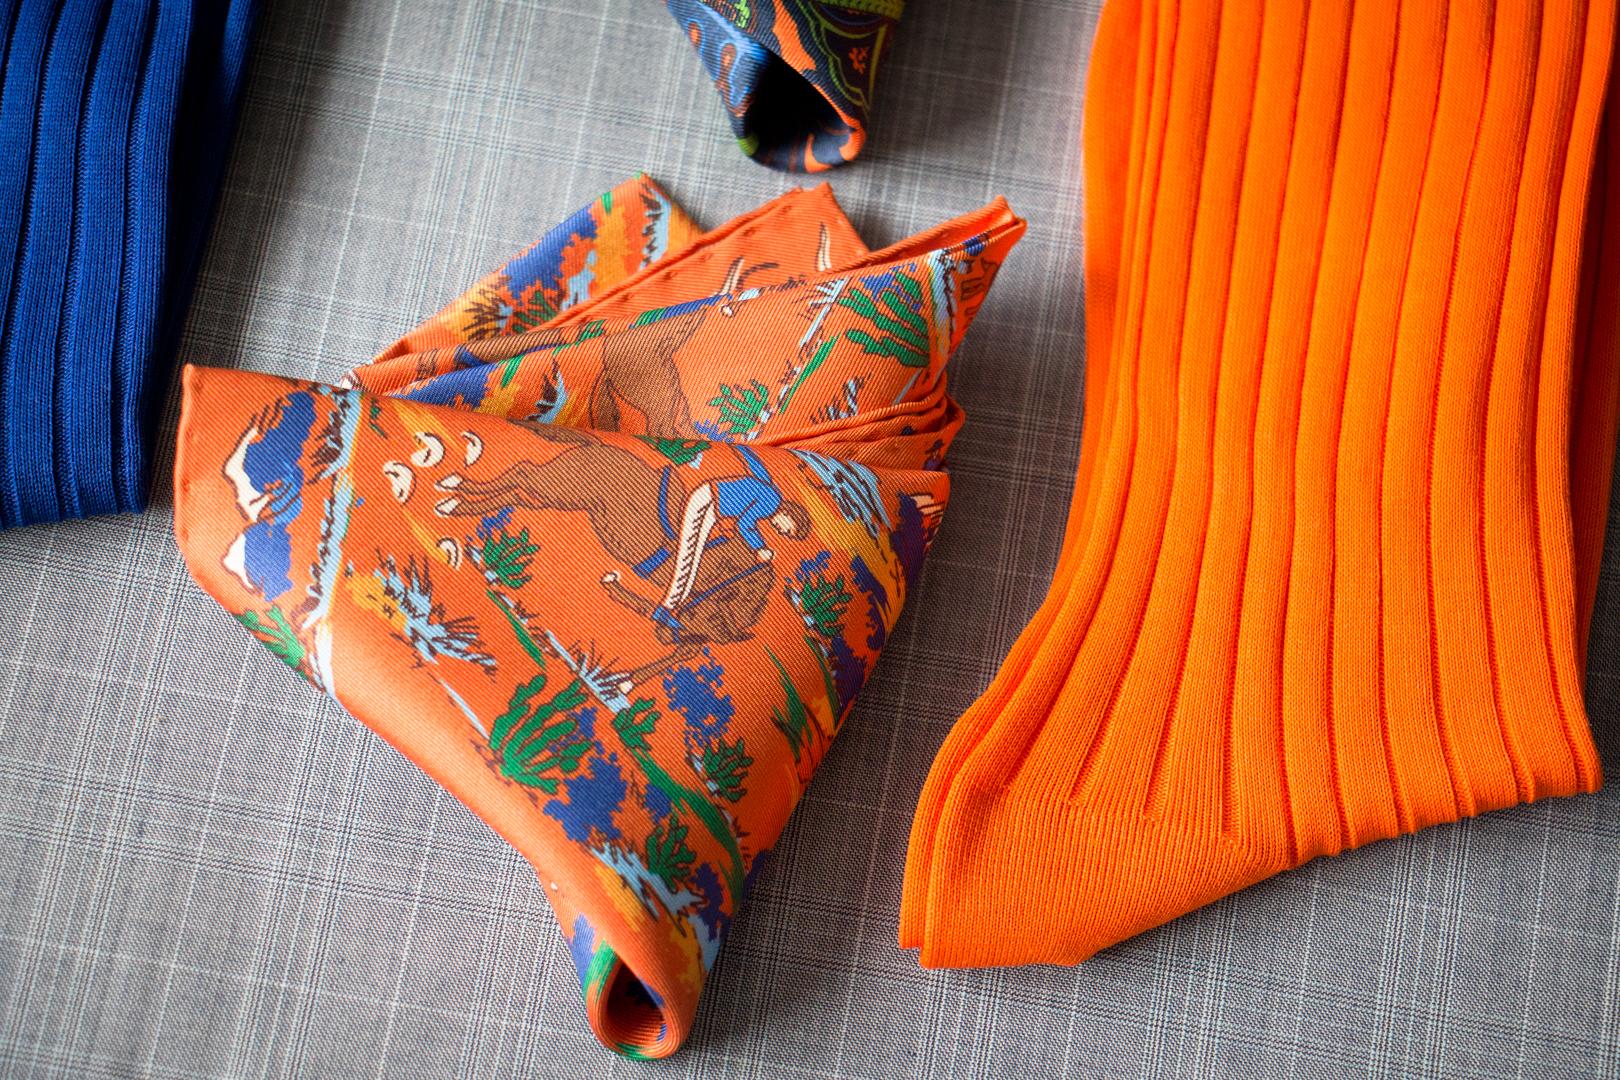 Luxury Socks and Pocket Square